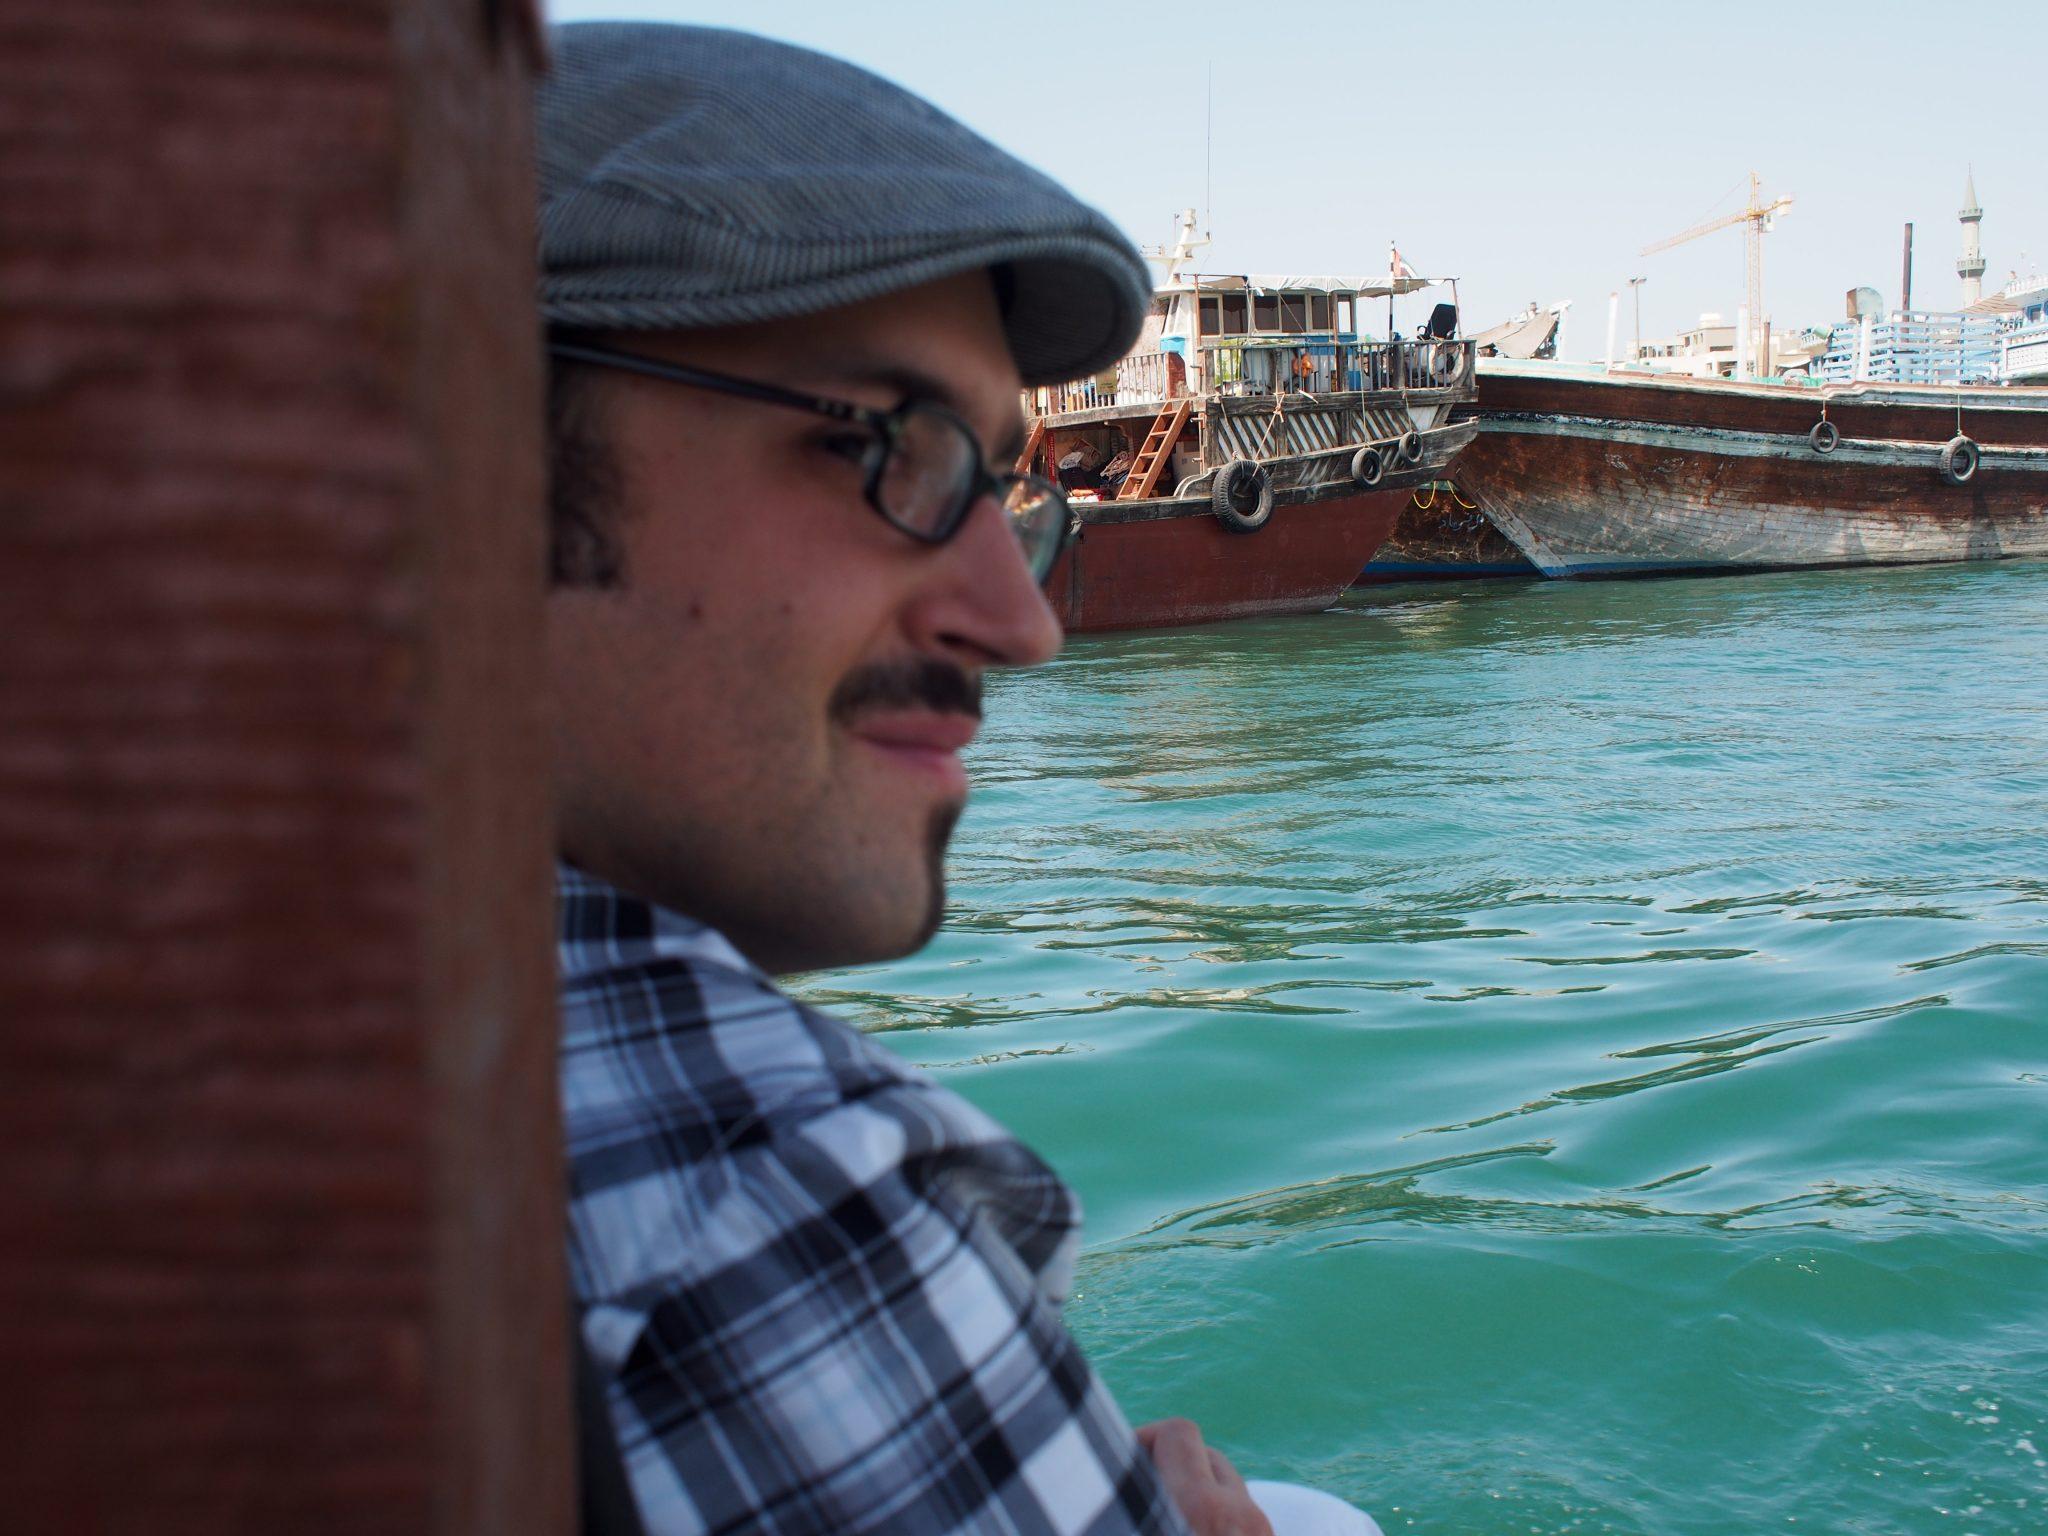 Micha L. Rieser 2013 in Dubai. Foto: Martin E. Walder. Lizenz: CC-BY-SA-3.0